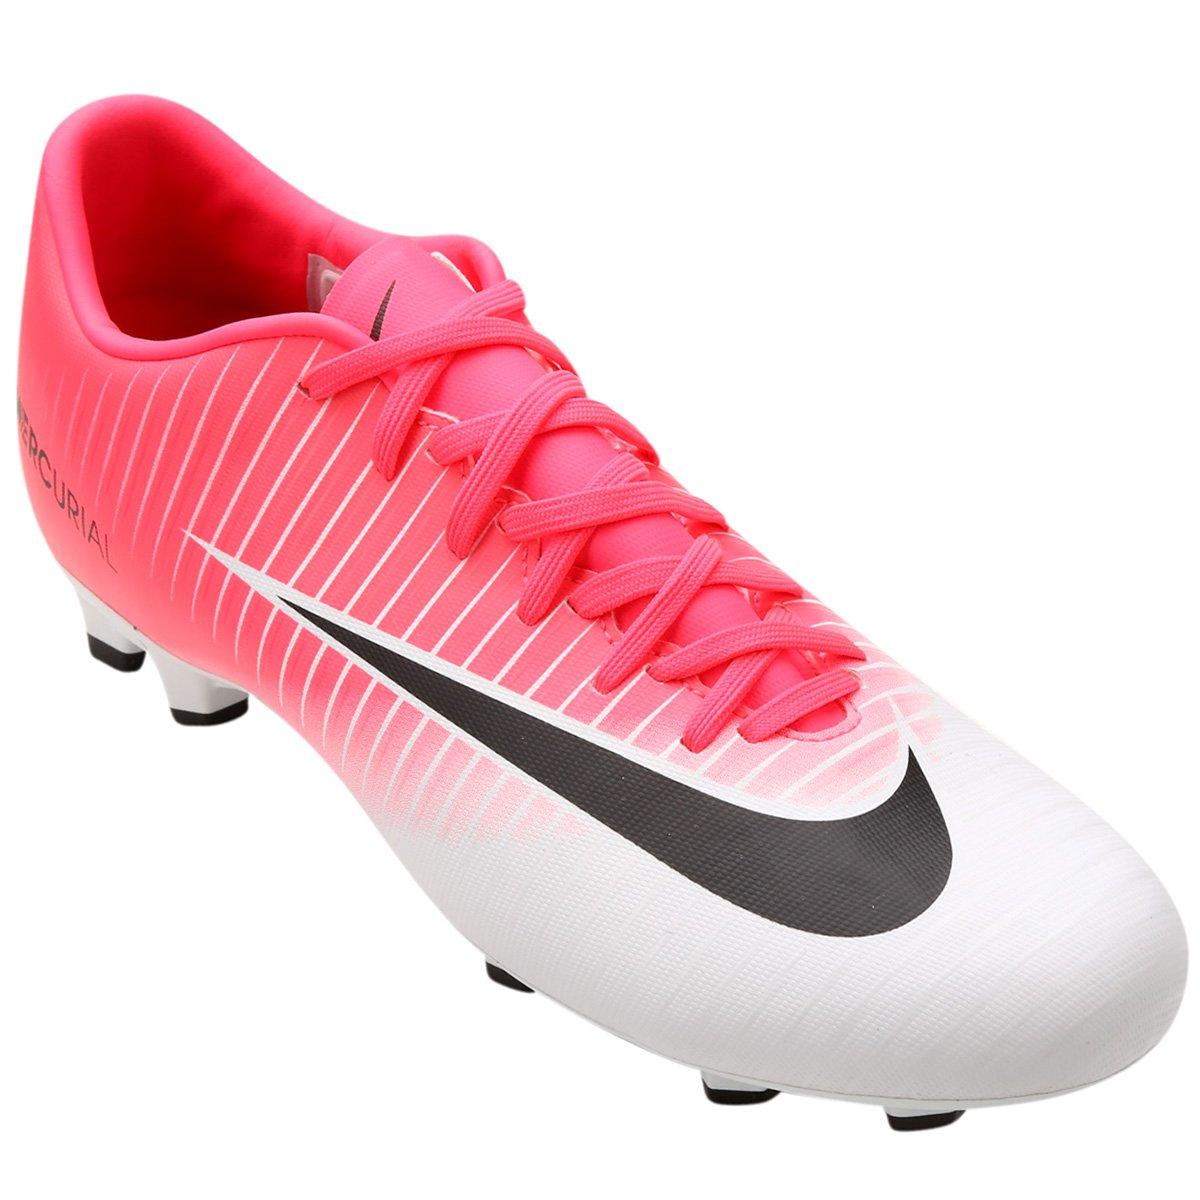 Chuteira Campo Nike Mercurial Victory 6 FG - Pink e Branco - Compre ... ecc4c4e8d0e94